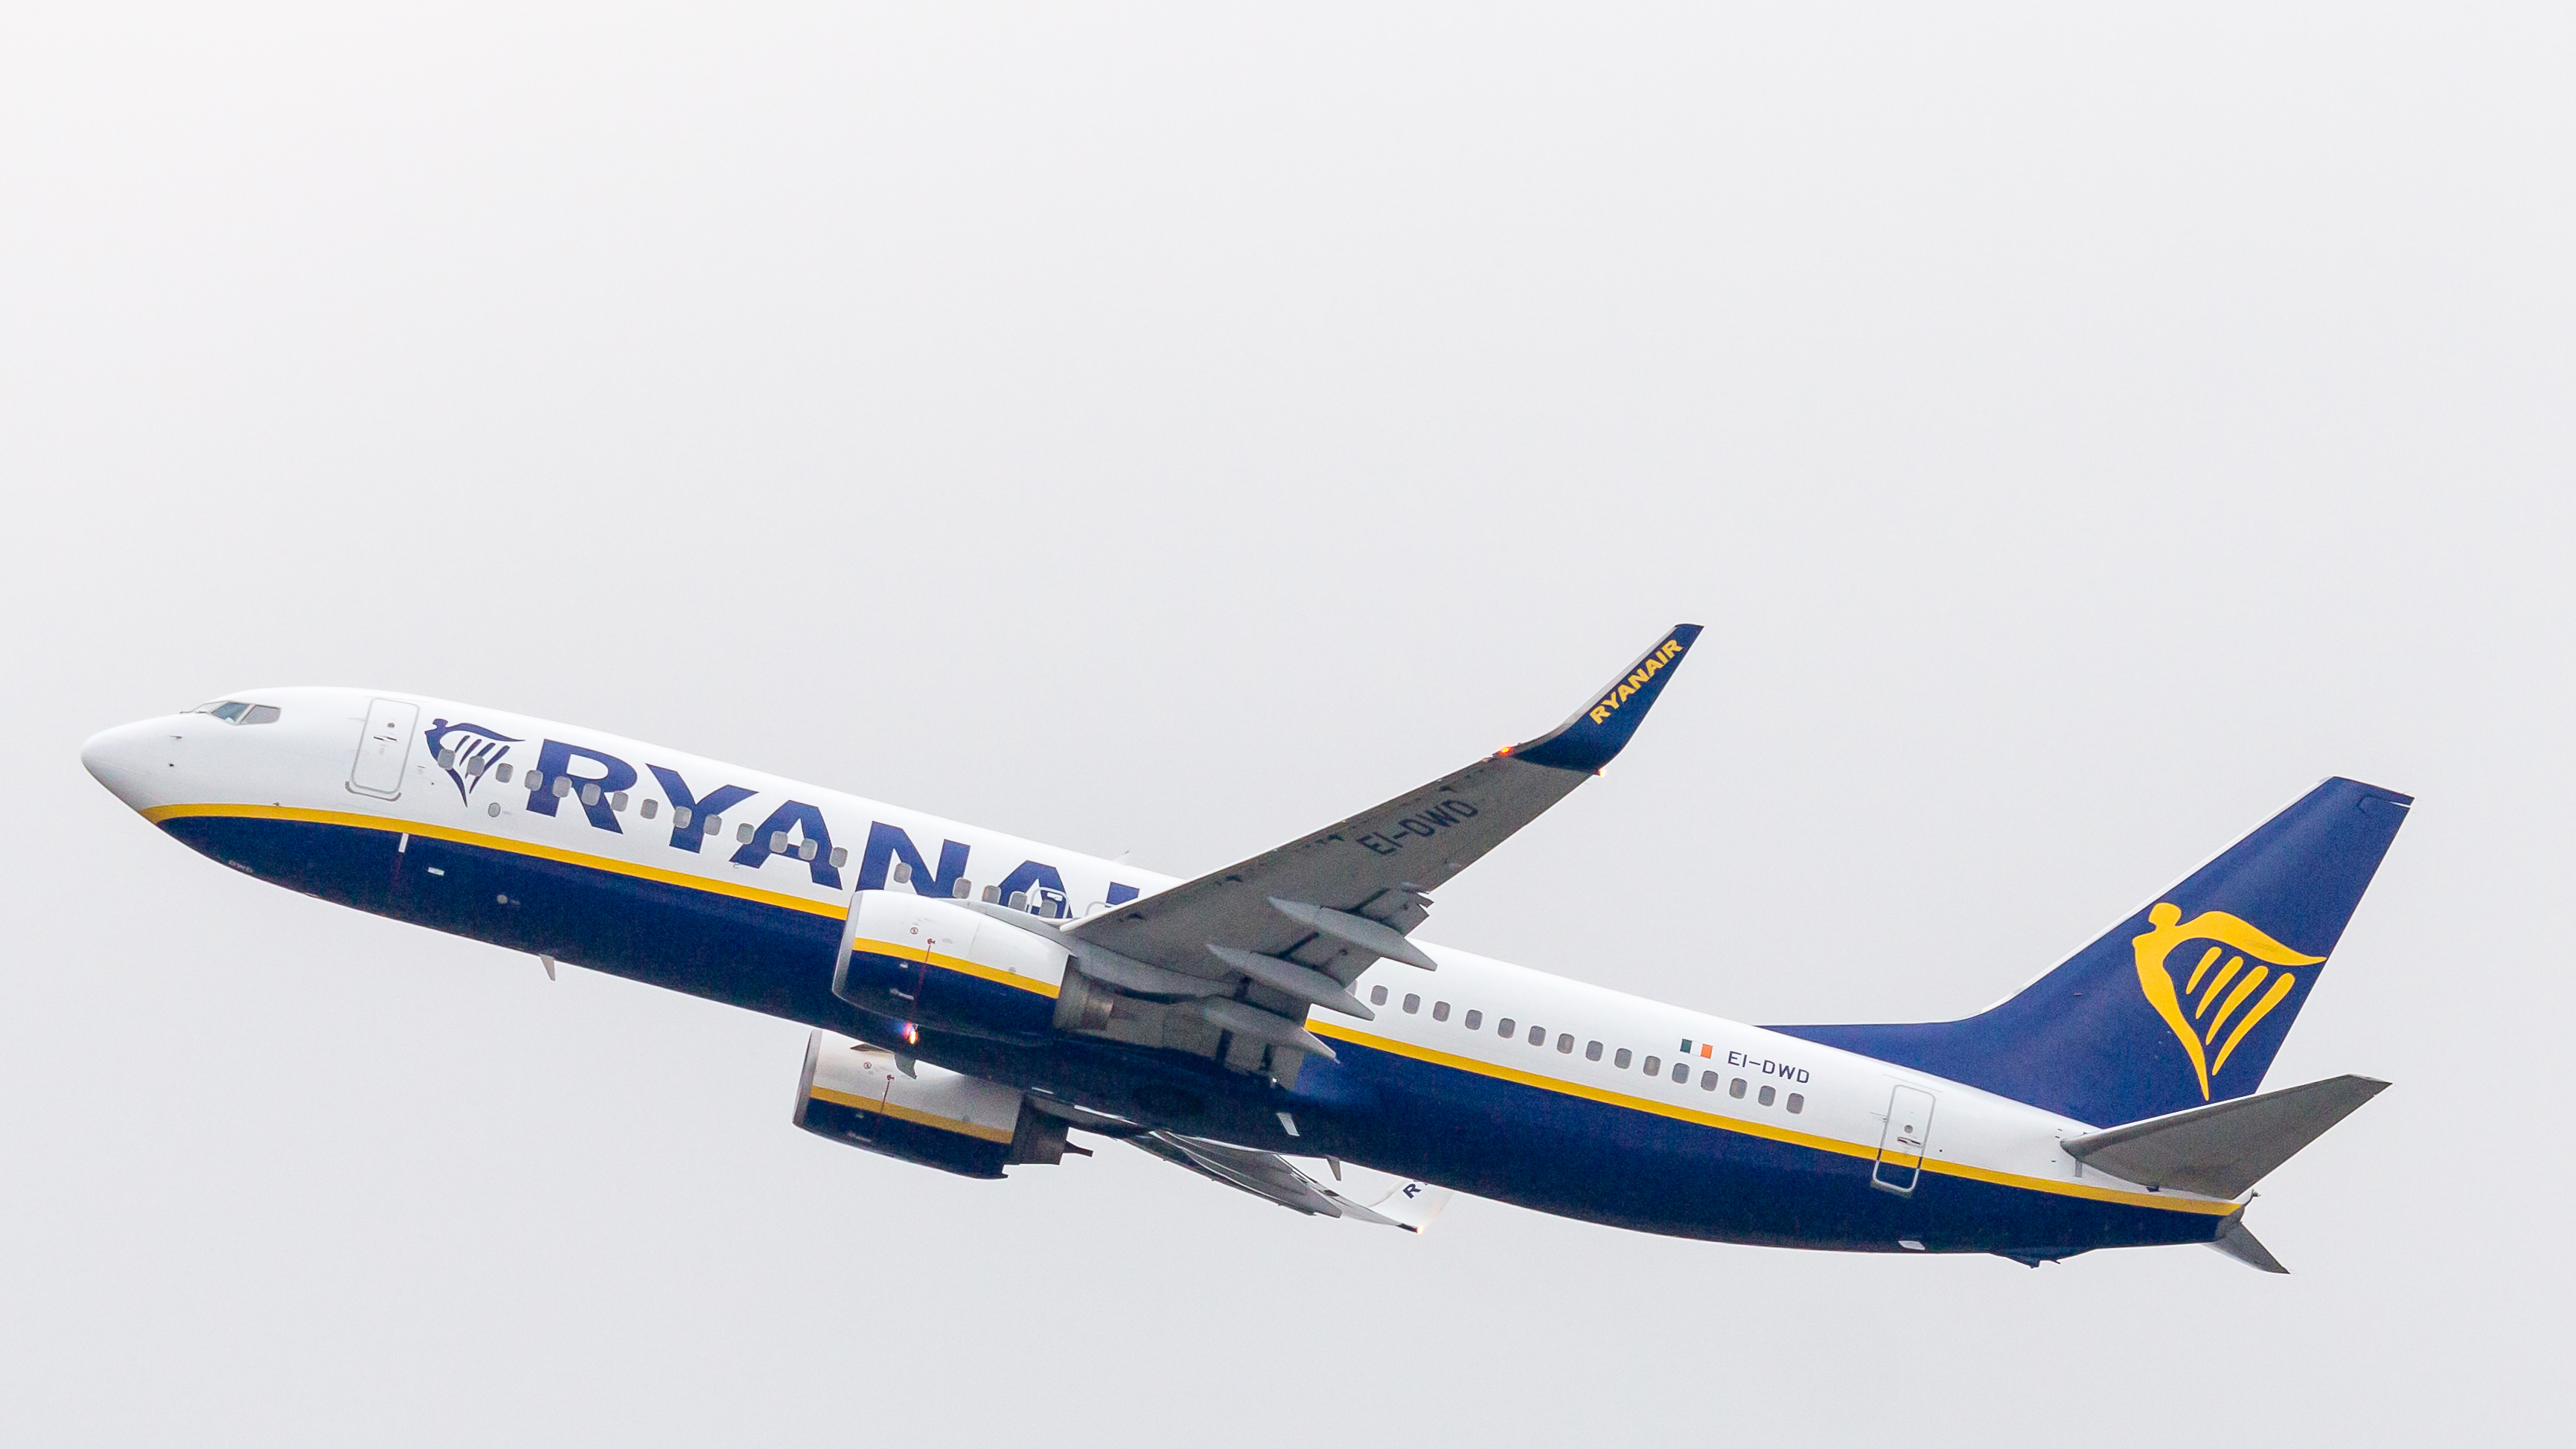 https://upload.wikimedia.org/wikipedia/commons/f/f5/Ryanair%2C_Boeing_737-800%2C_EI-DWD%2C_Airport_Cologne_Bonn-7175.jpg